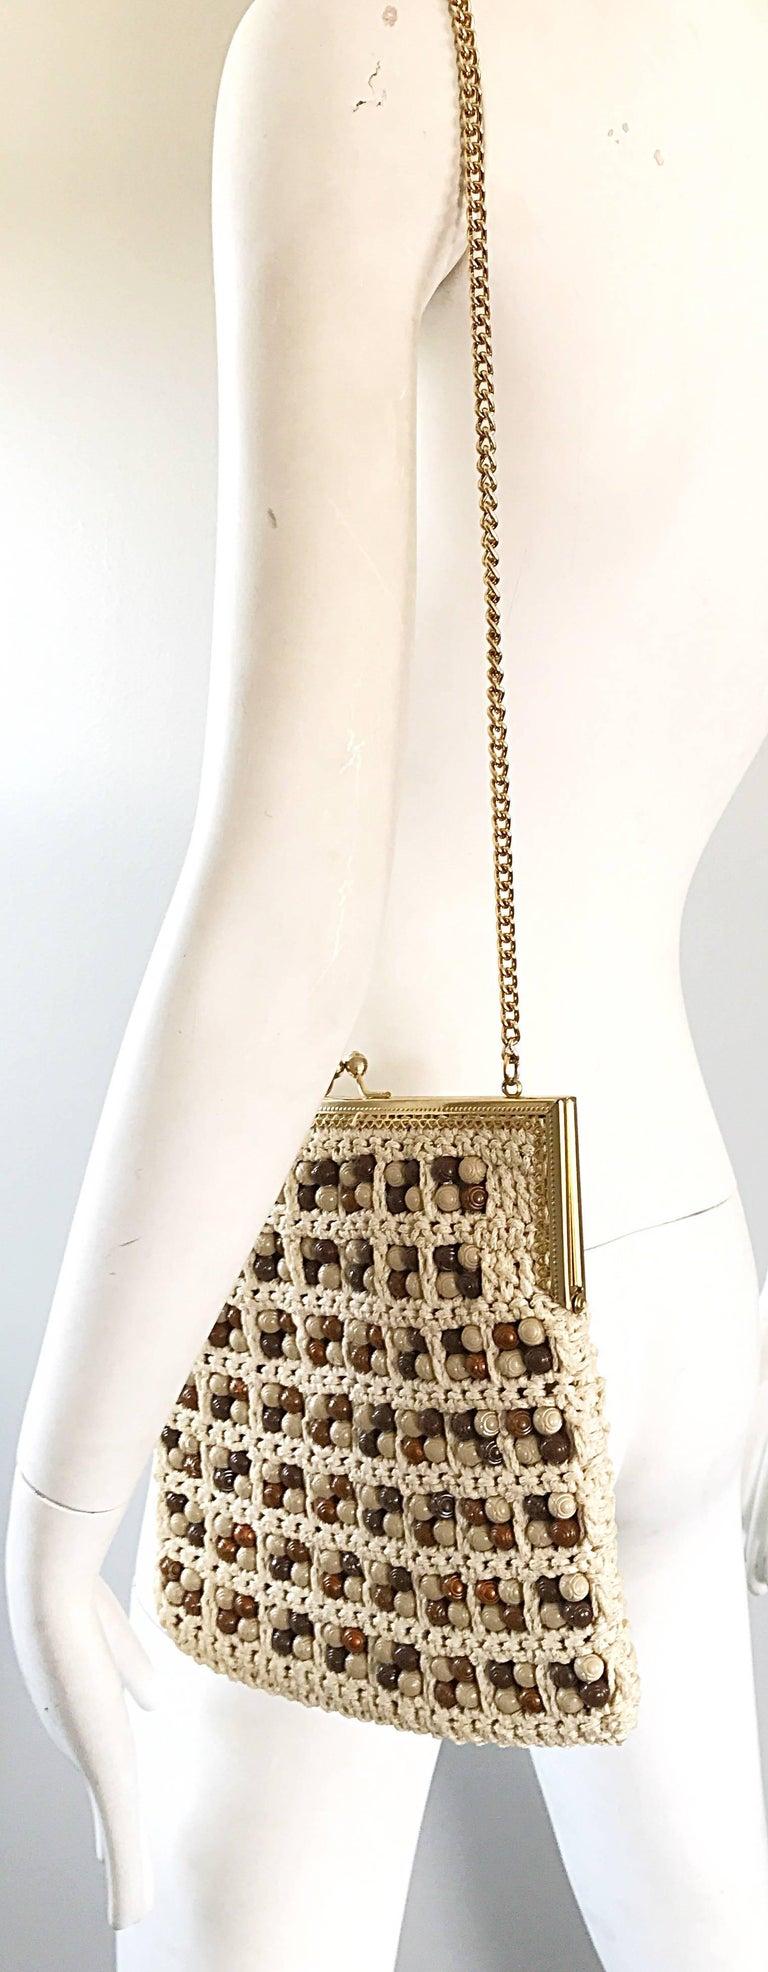 1970s Italian Ivory + Brown Hand Crochet Gold Chain Boho Vintage Shoulder Bag  For Sale 3